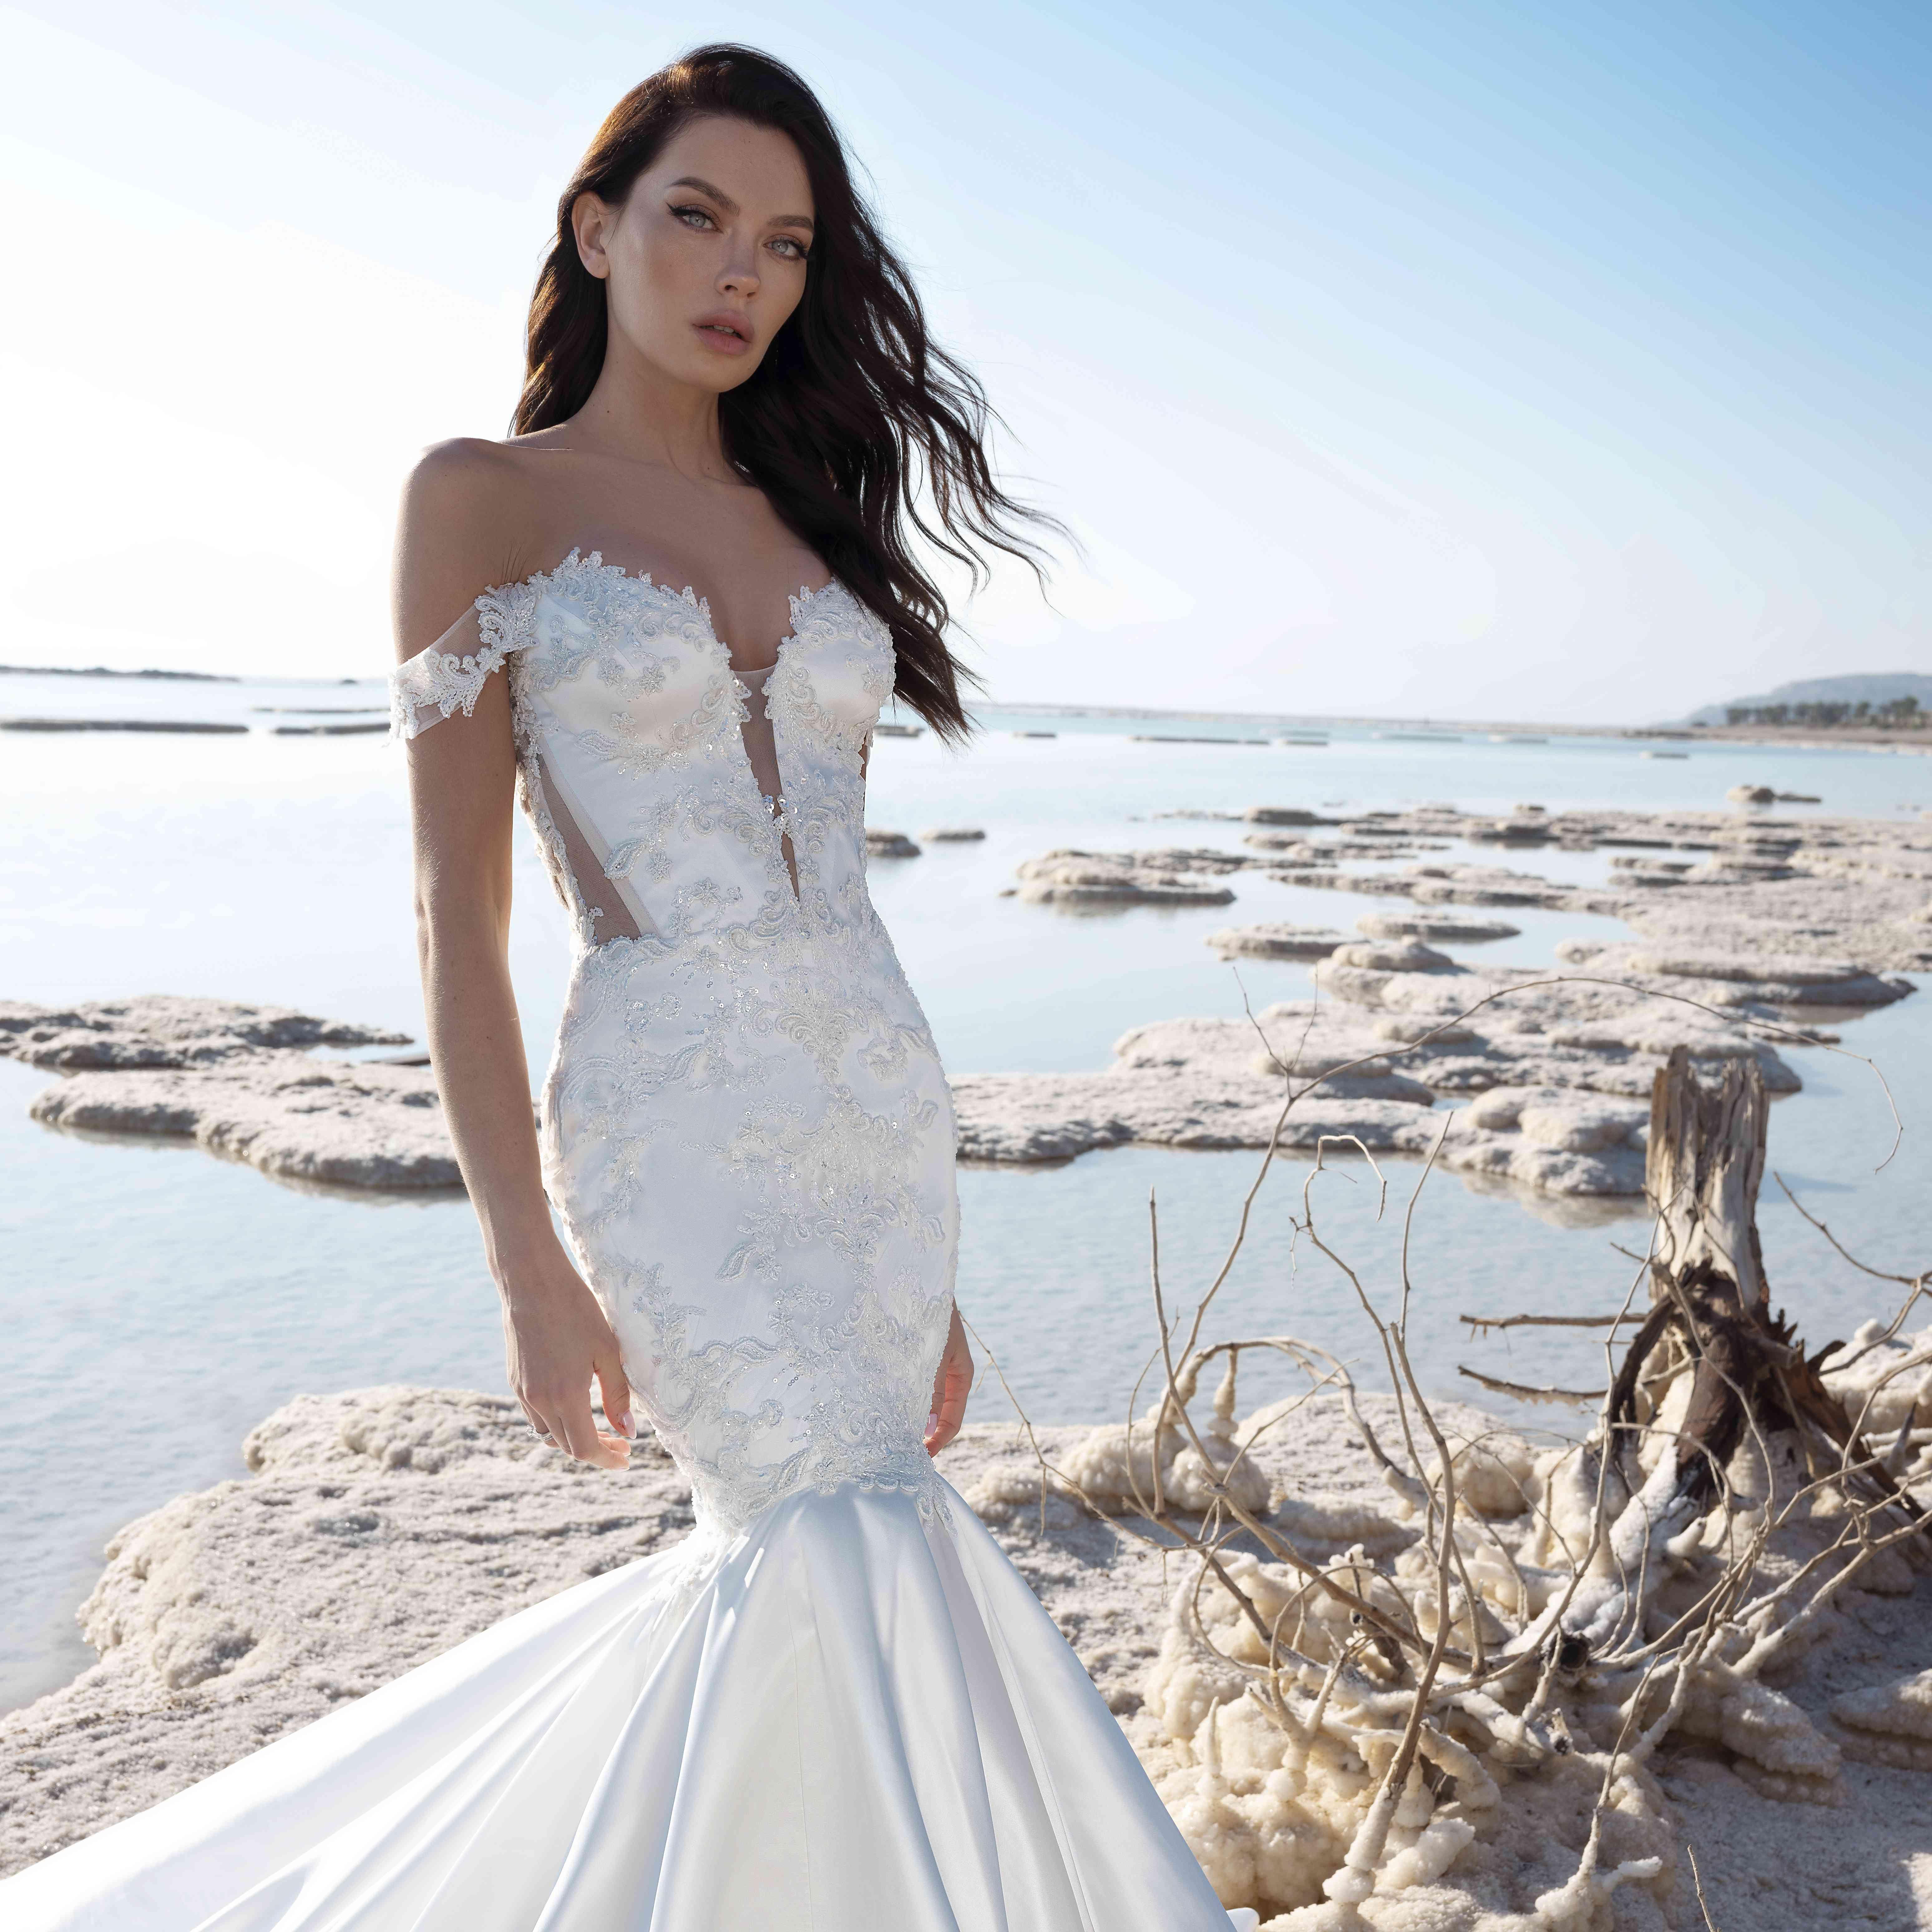 Pnina Tornai Wedding Dresses 2019: Pnina Tornai Bridal Spring 2020